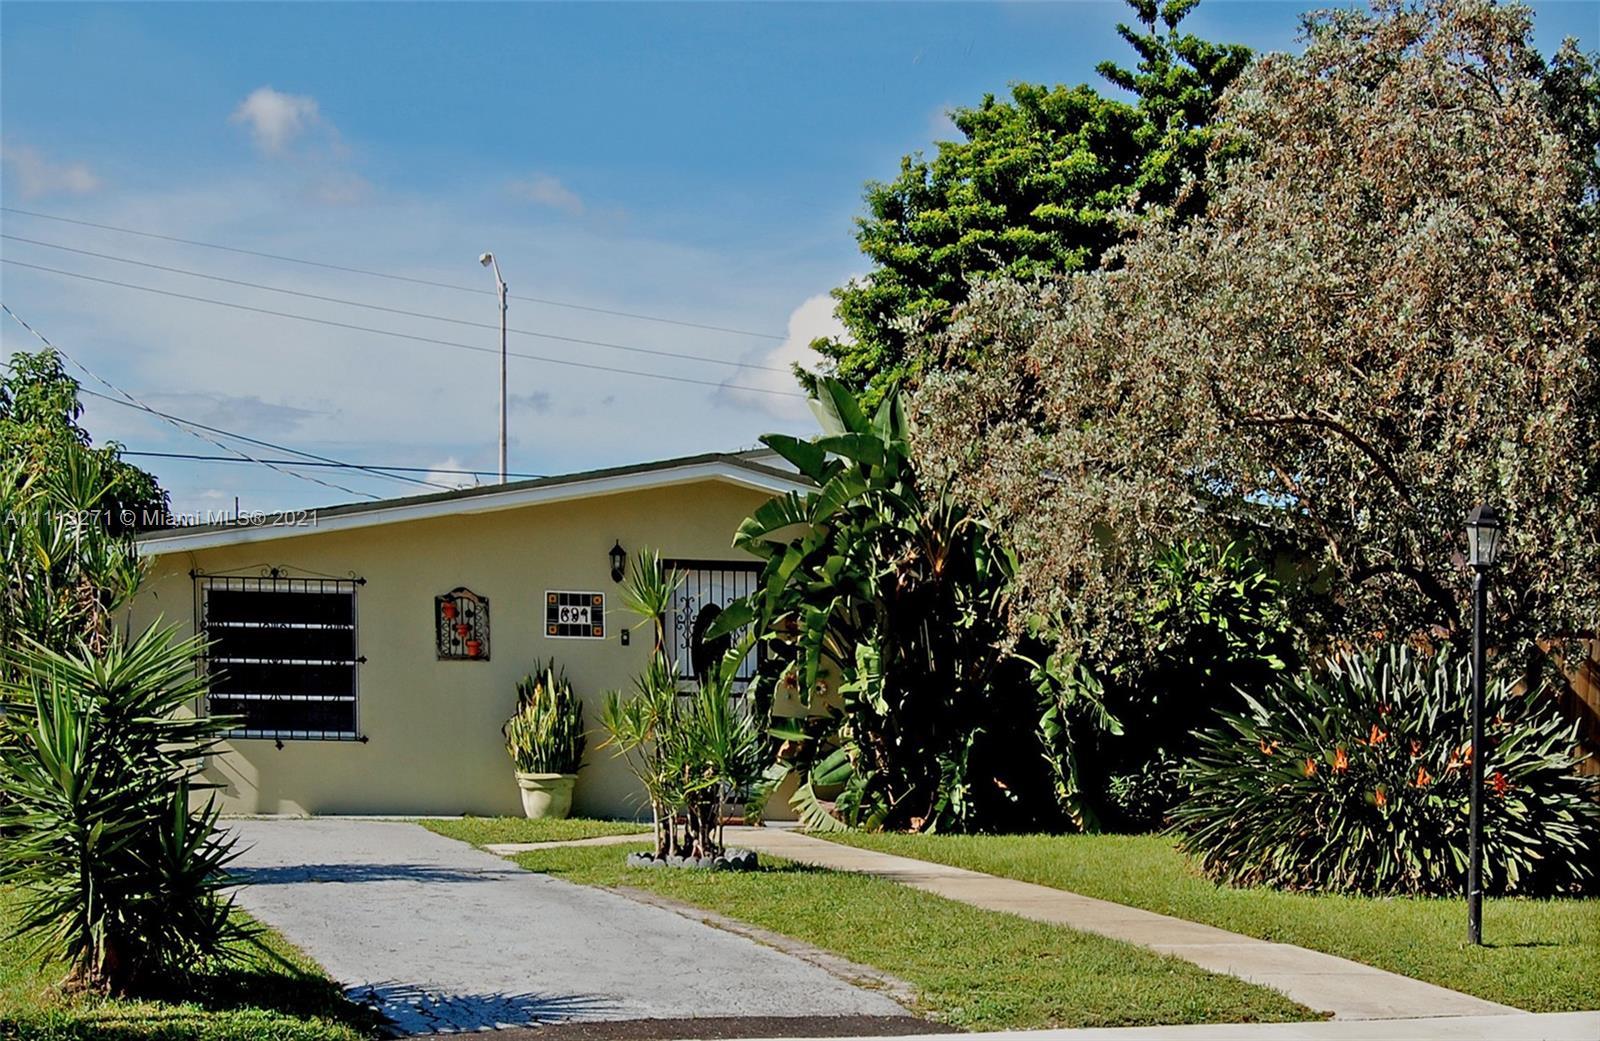 Single Family Home,For Sale,691 SE 2 PL, Hialeah, Florida 33010,Brickell,realty,broker,condos near me